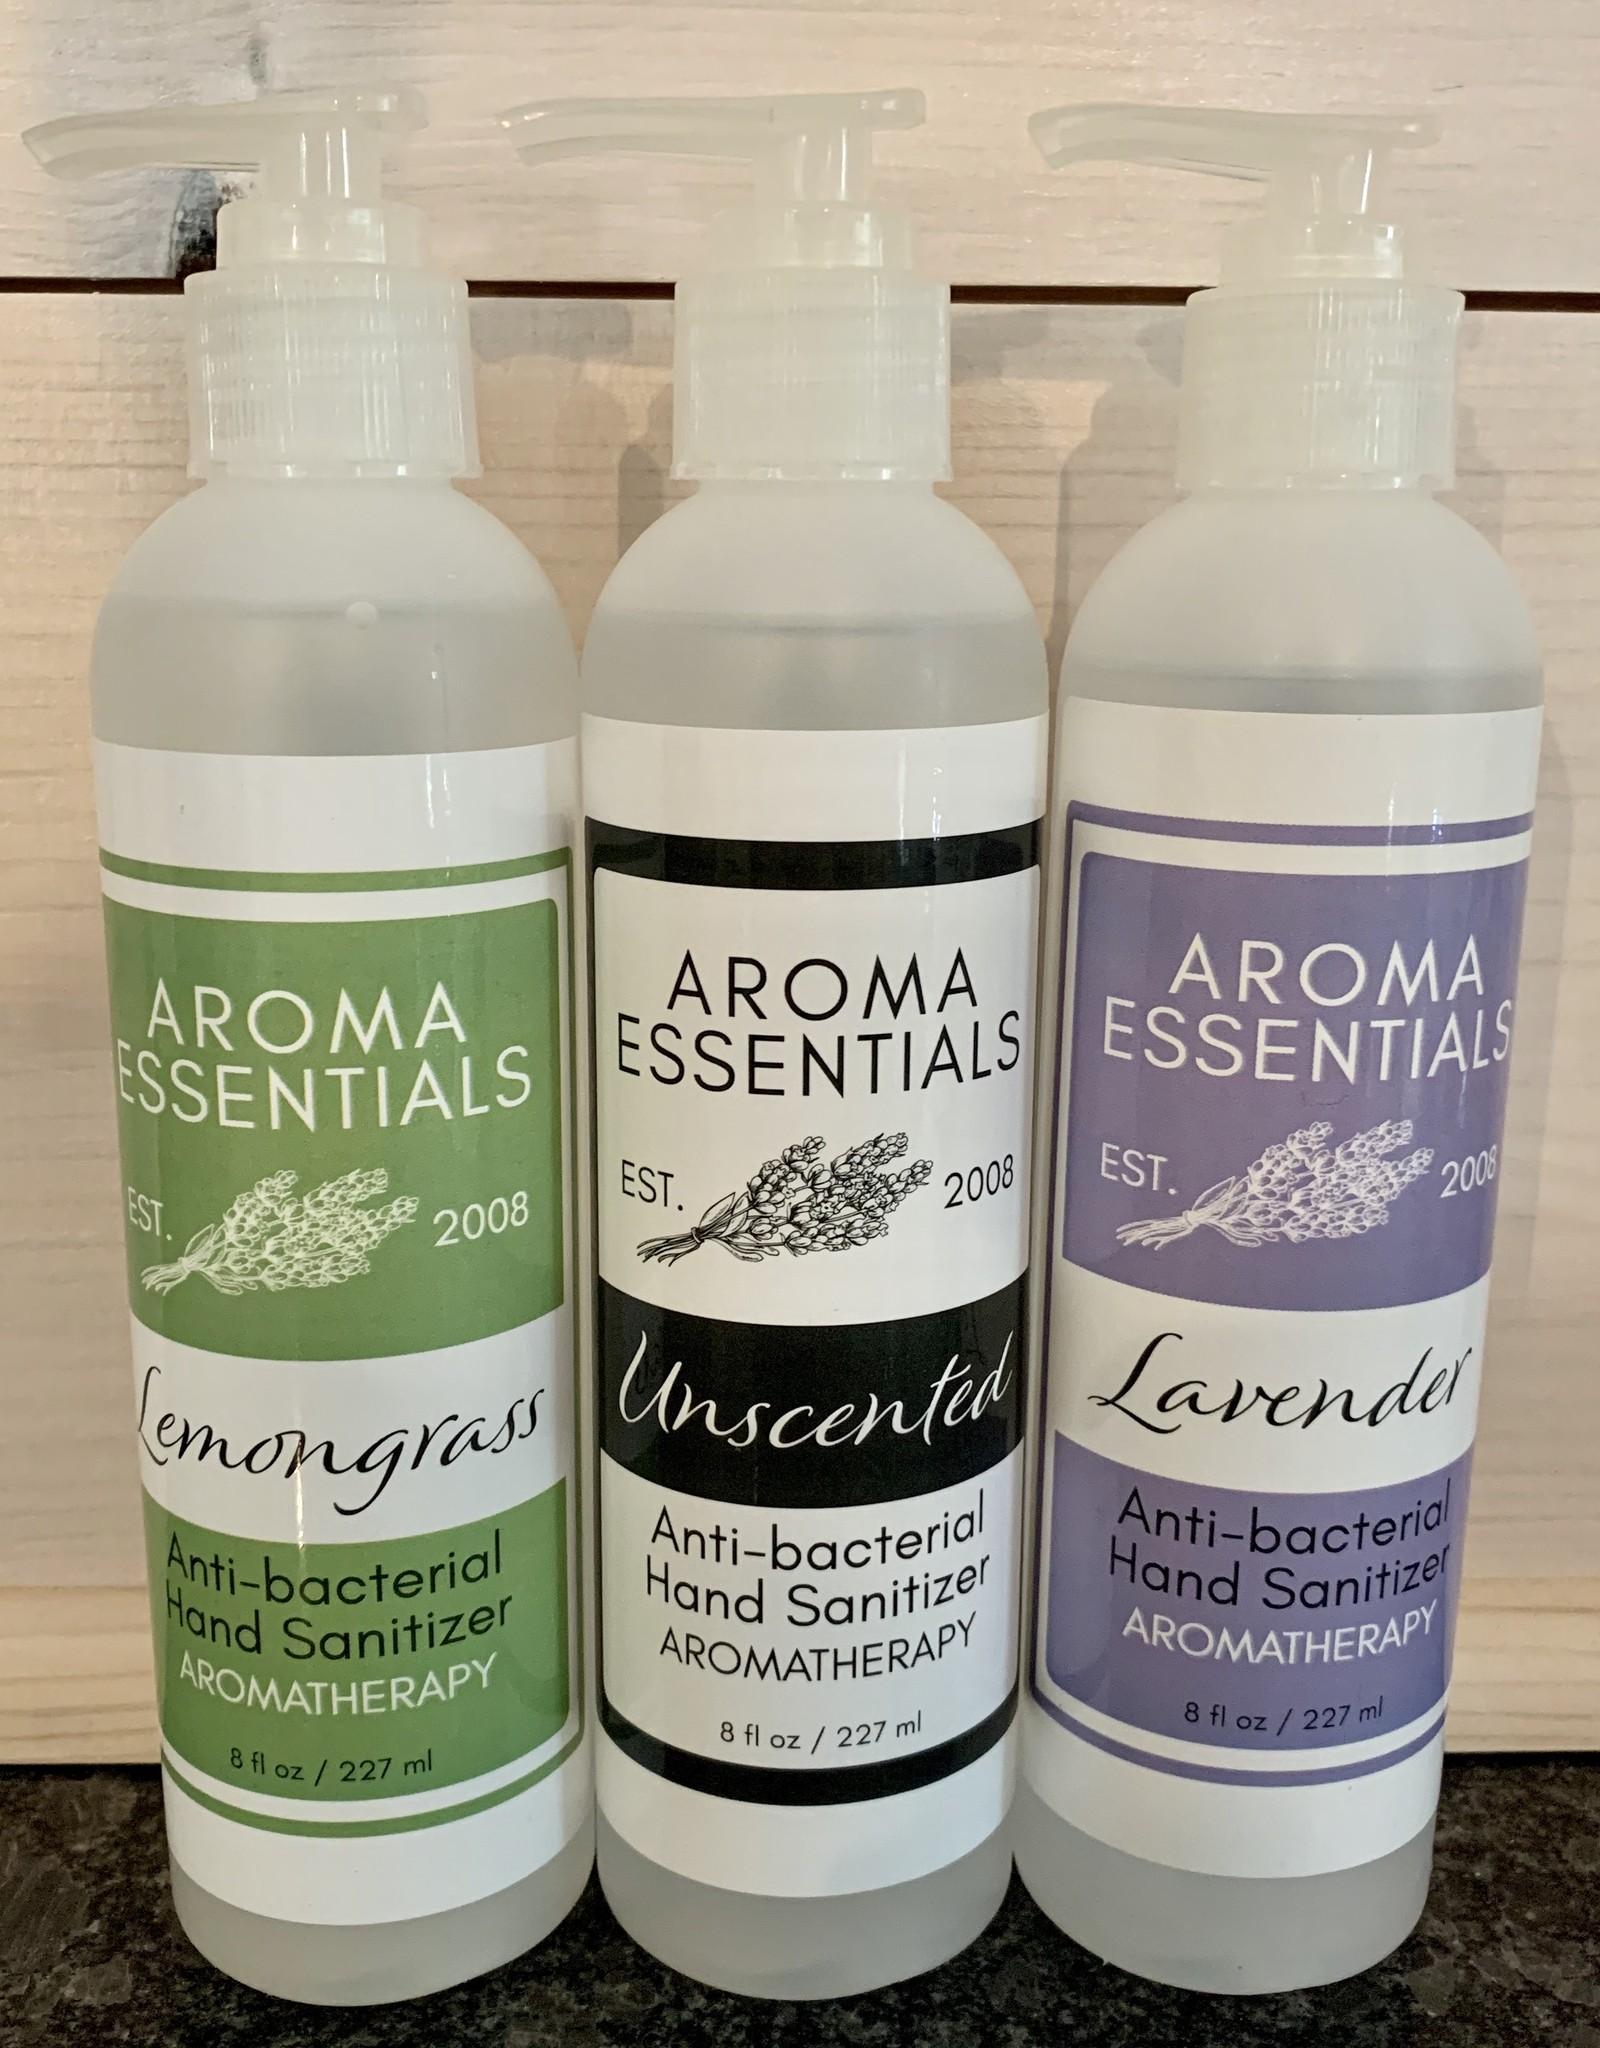 Soy Essentials Soy Essentials - Hand Sanitizer Lavender